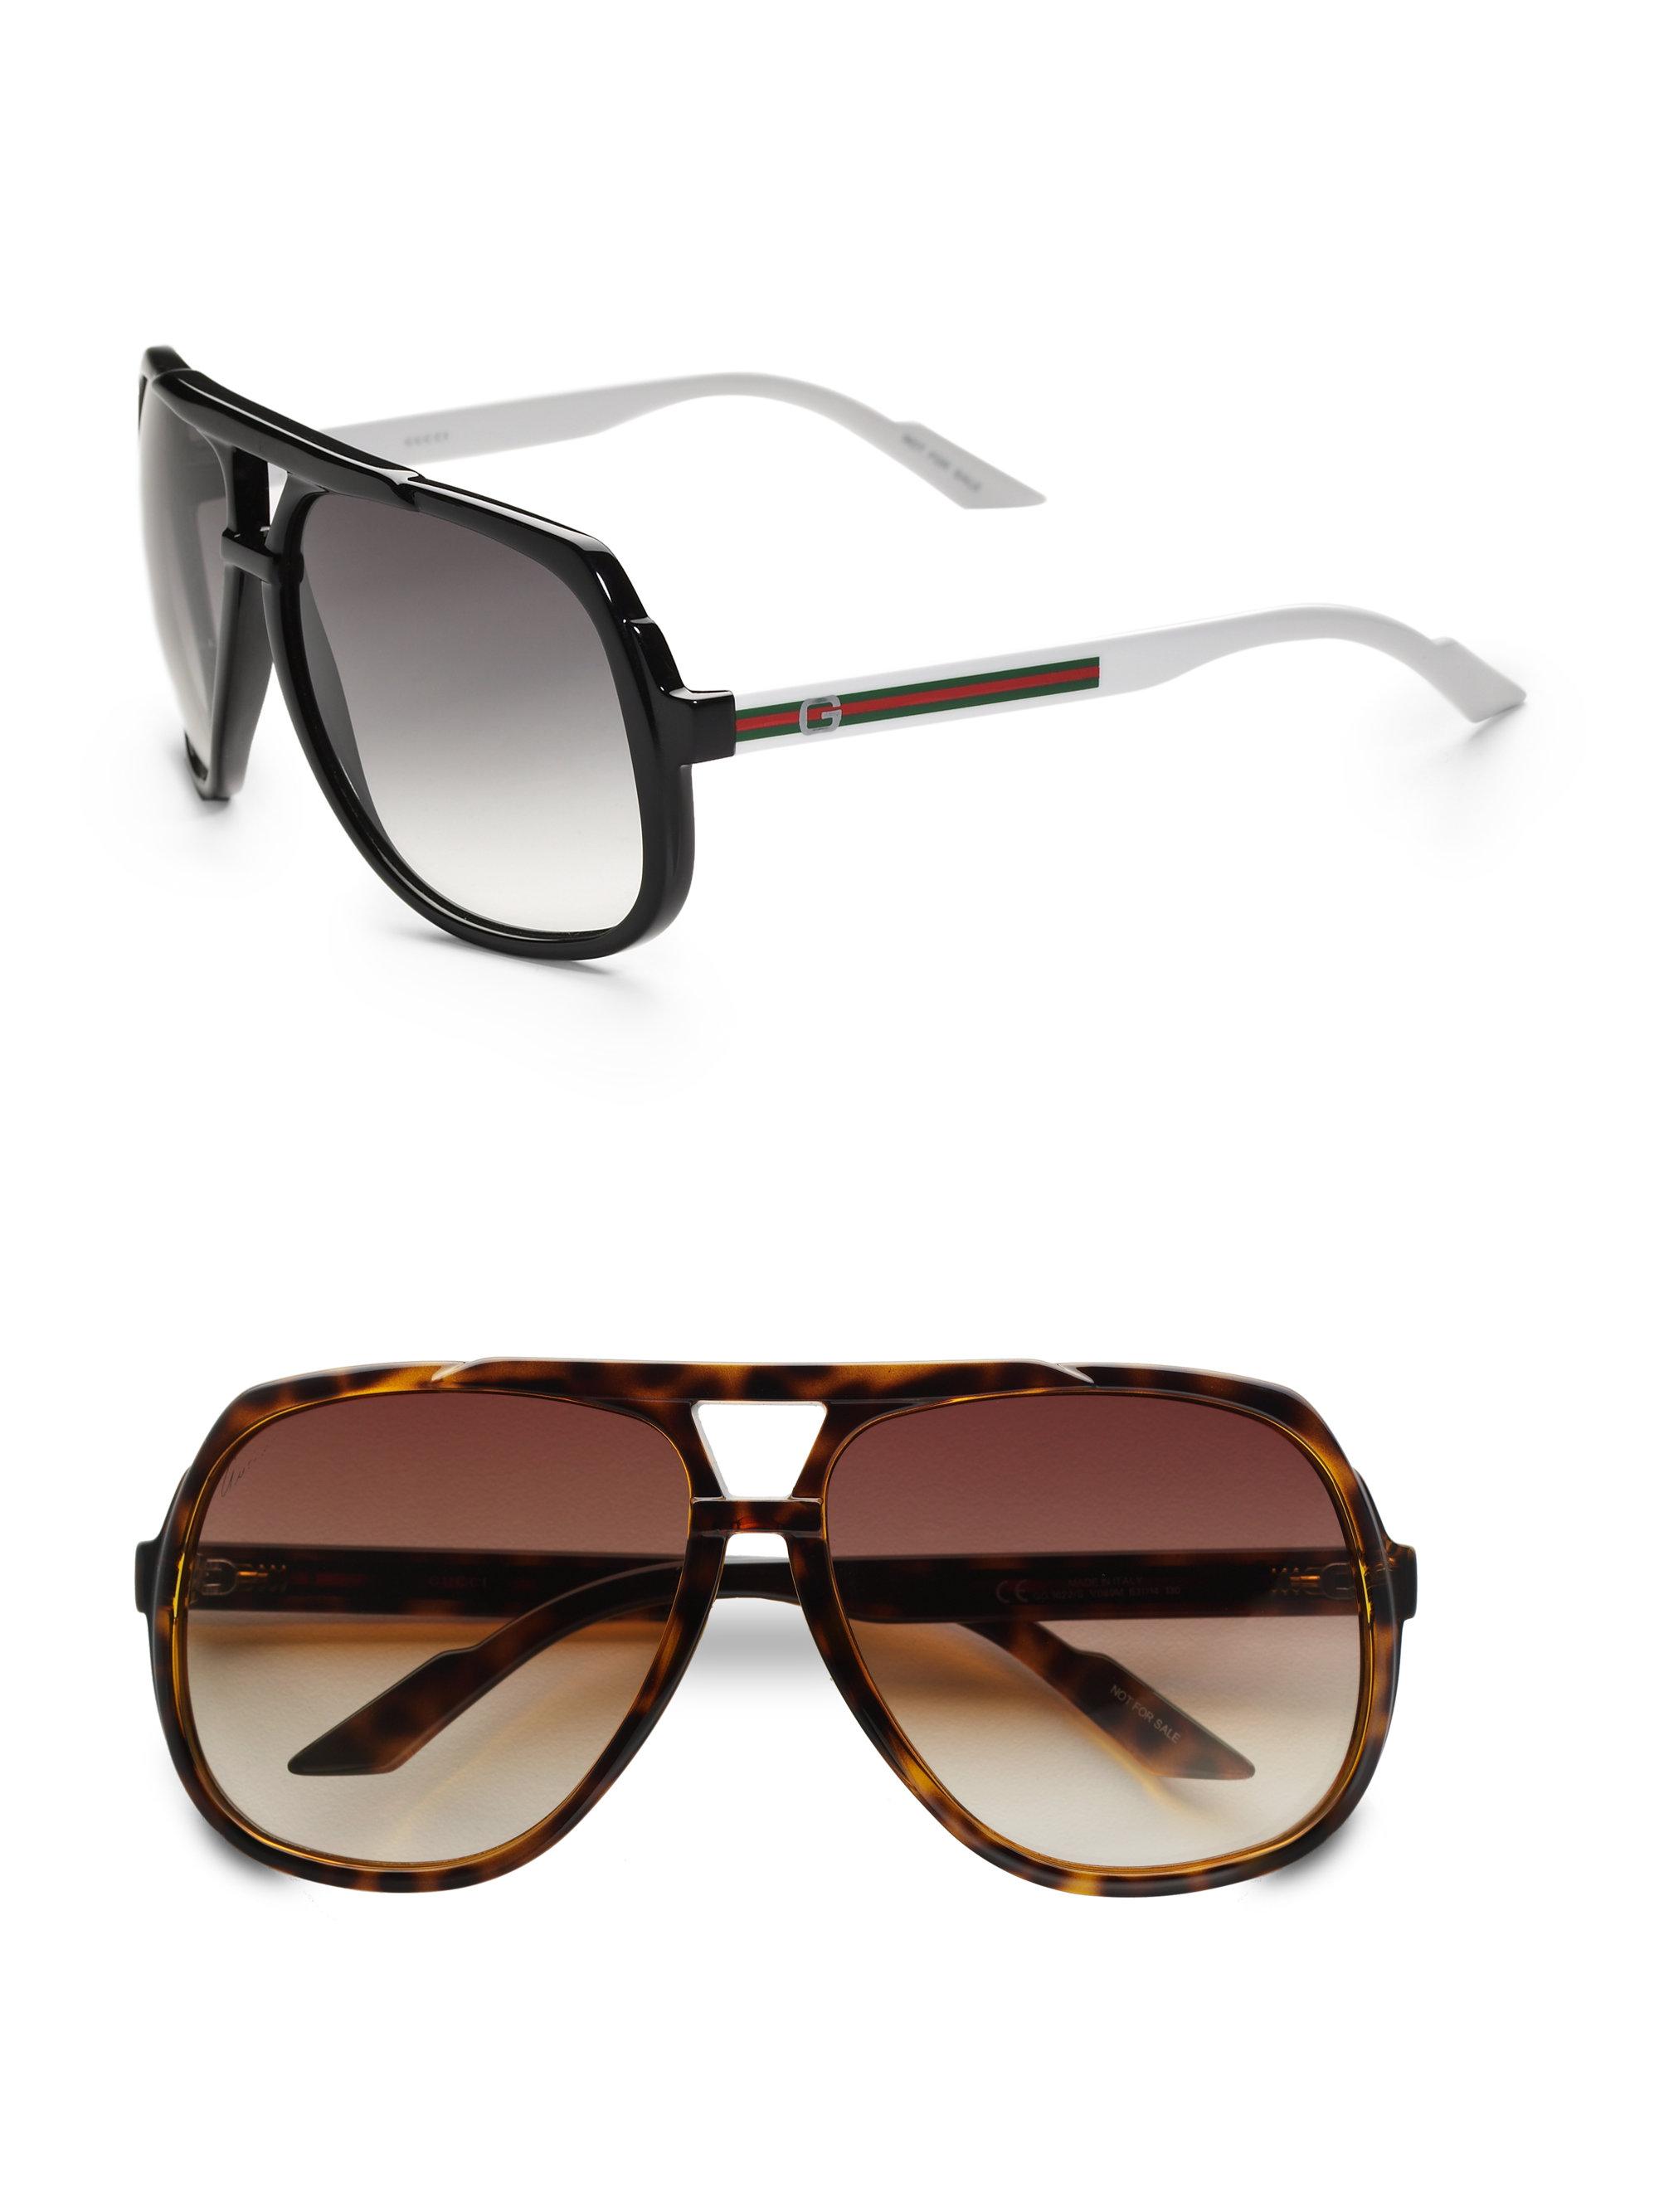 98656d1f65b Lyst - Gucci Plastic Aviator Sunglasses in Brown for Men